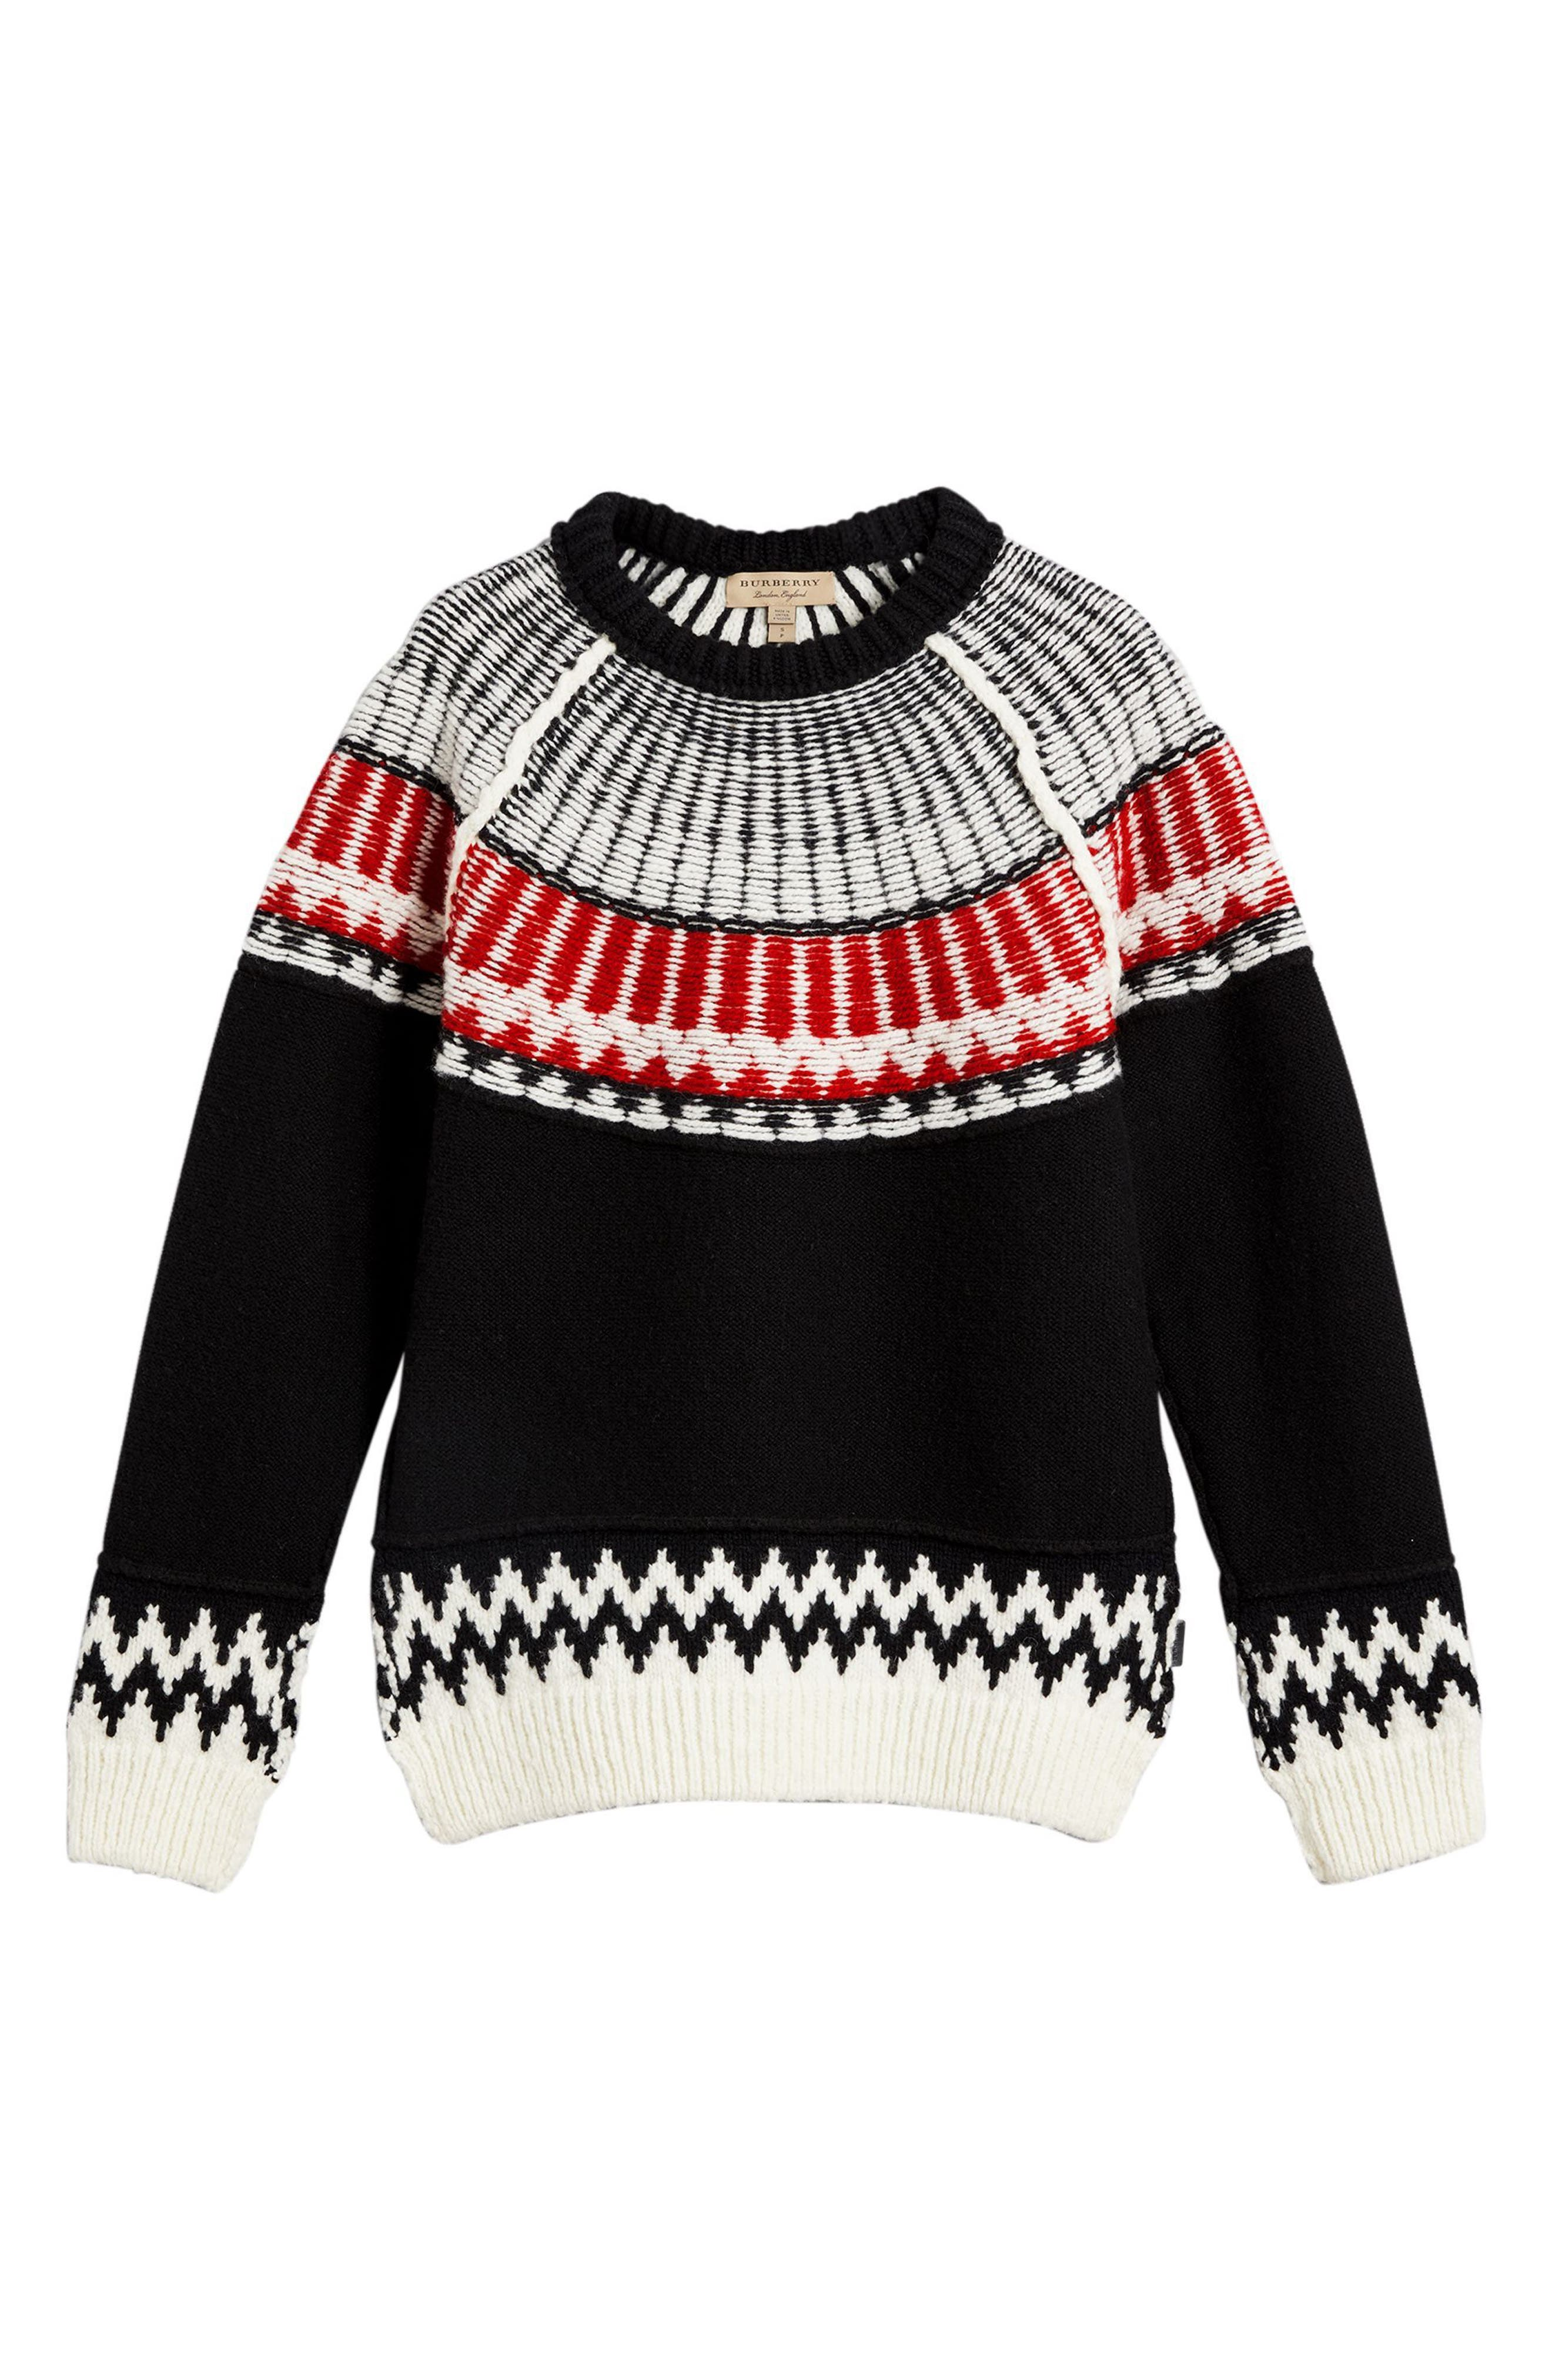 Burberry Trycroft Fair Isle Wool Blend Sweater | Nordstrom